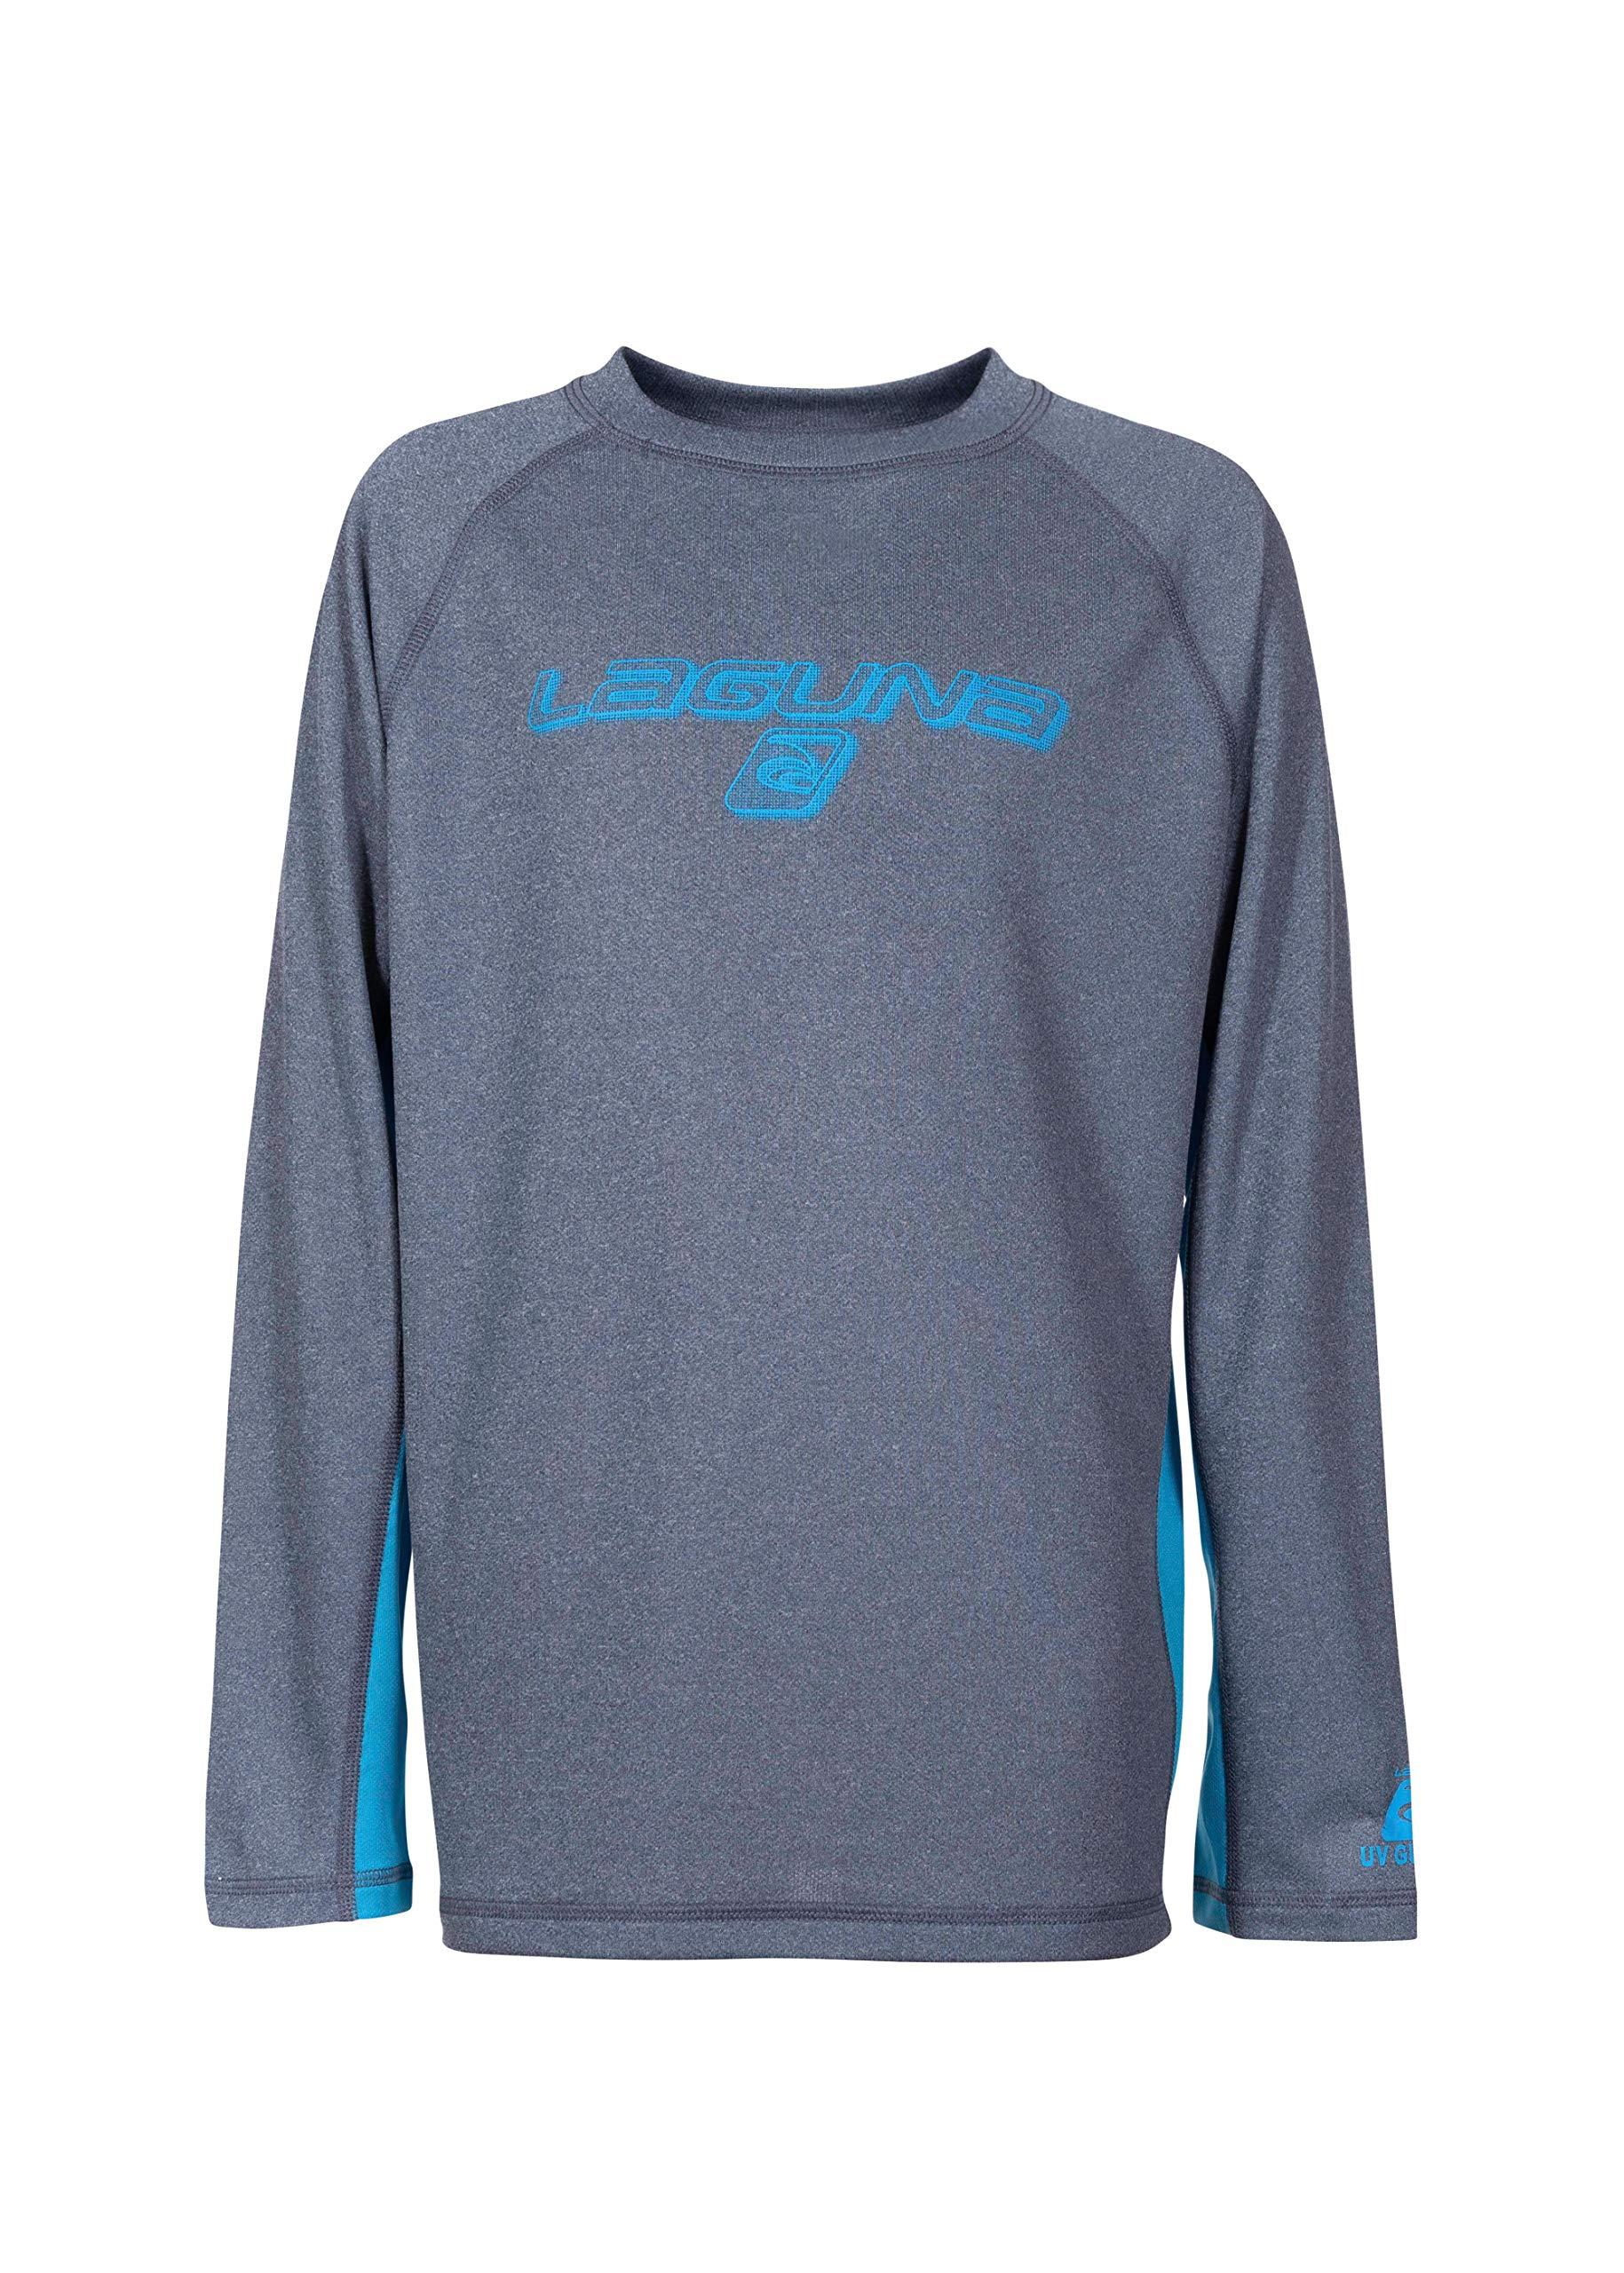 LAGUNA Boys Crewneck Long Sleeve Loose Fit Rashguard Swim Sun Tee Shirt, UPF 50+, Heather Navy Blue/Blue, 10/12